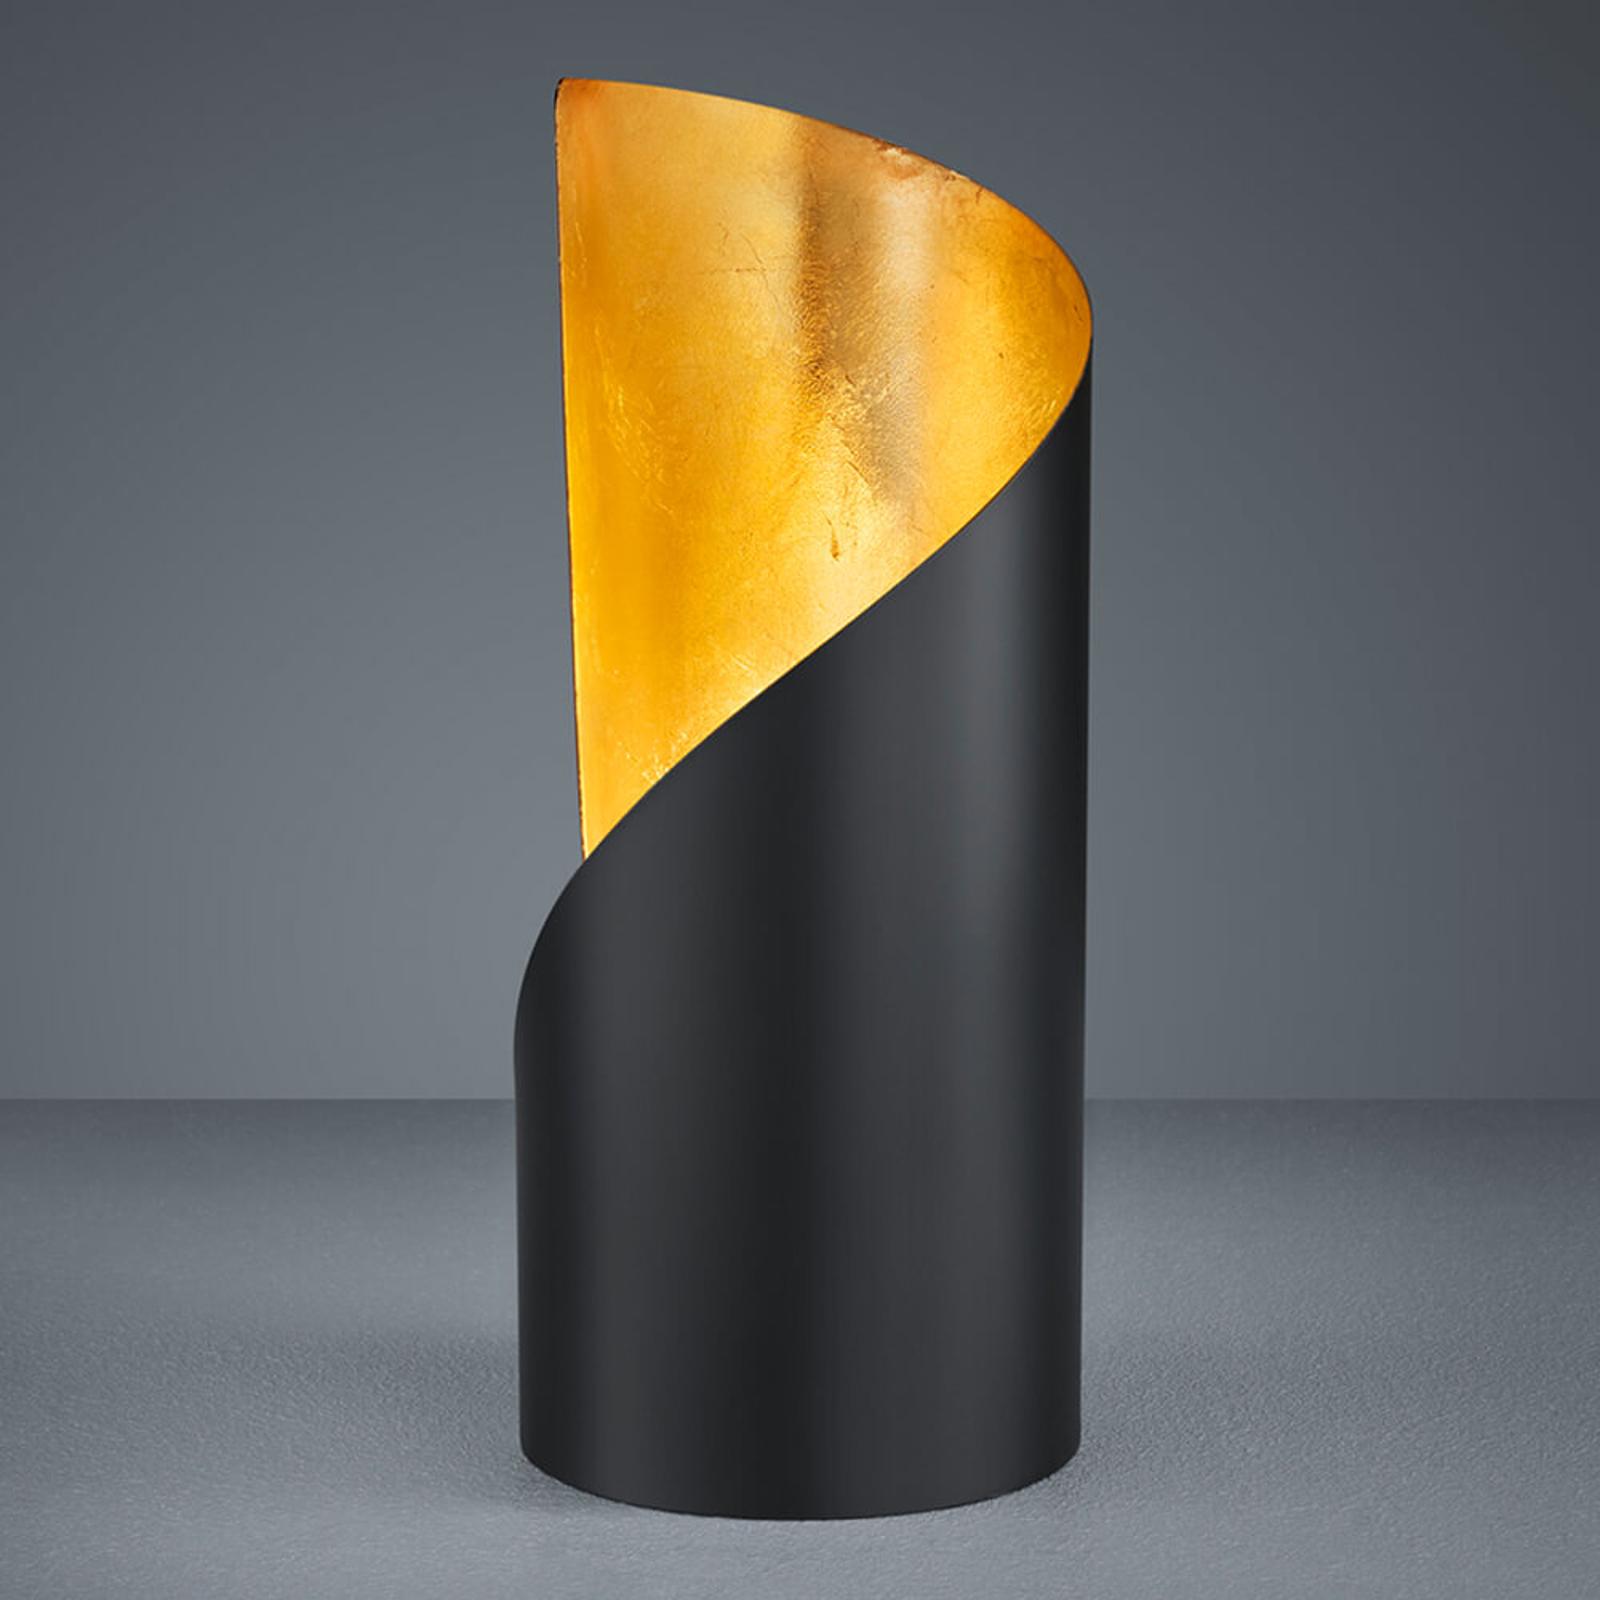 Pöytälamppu Frank - musta ja kulta